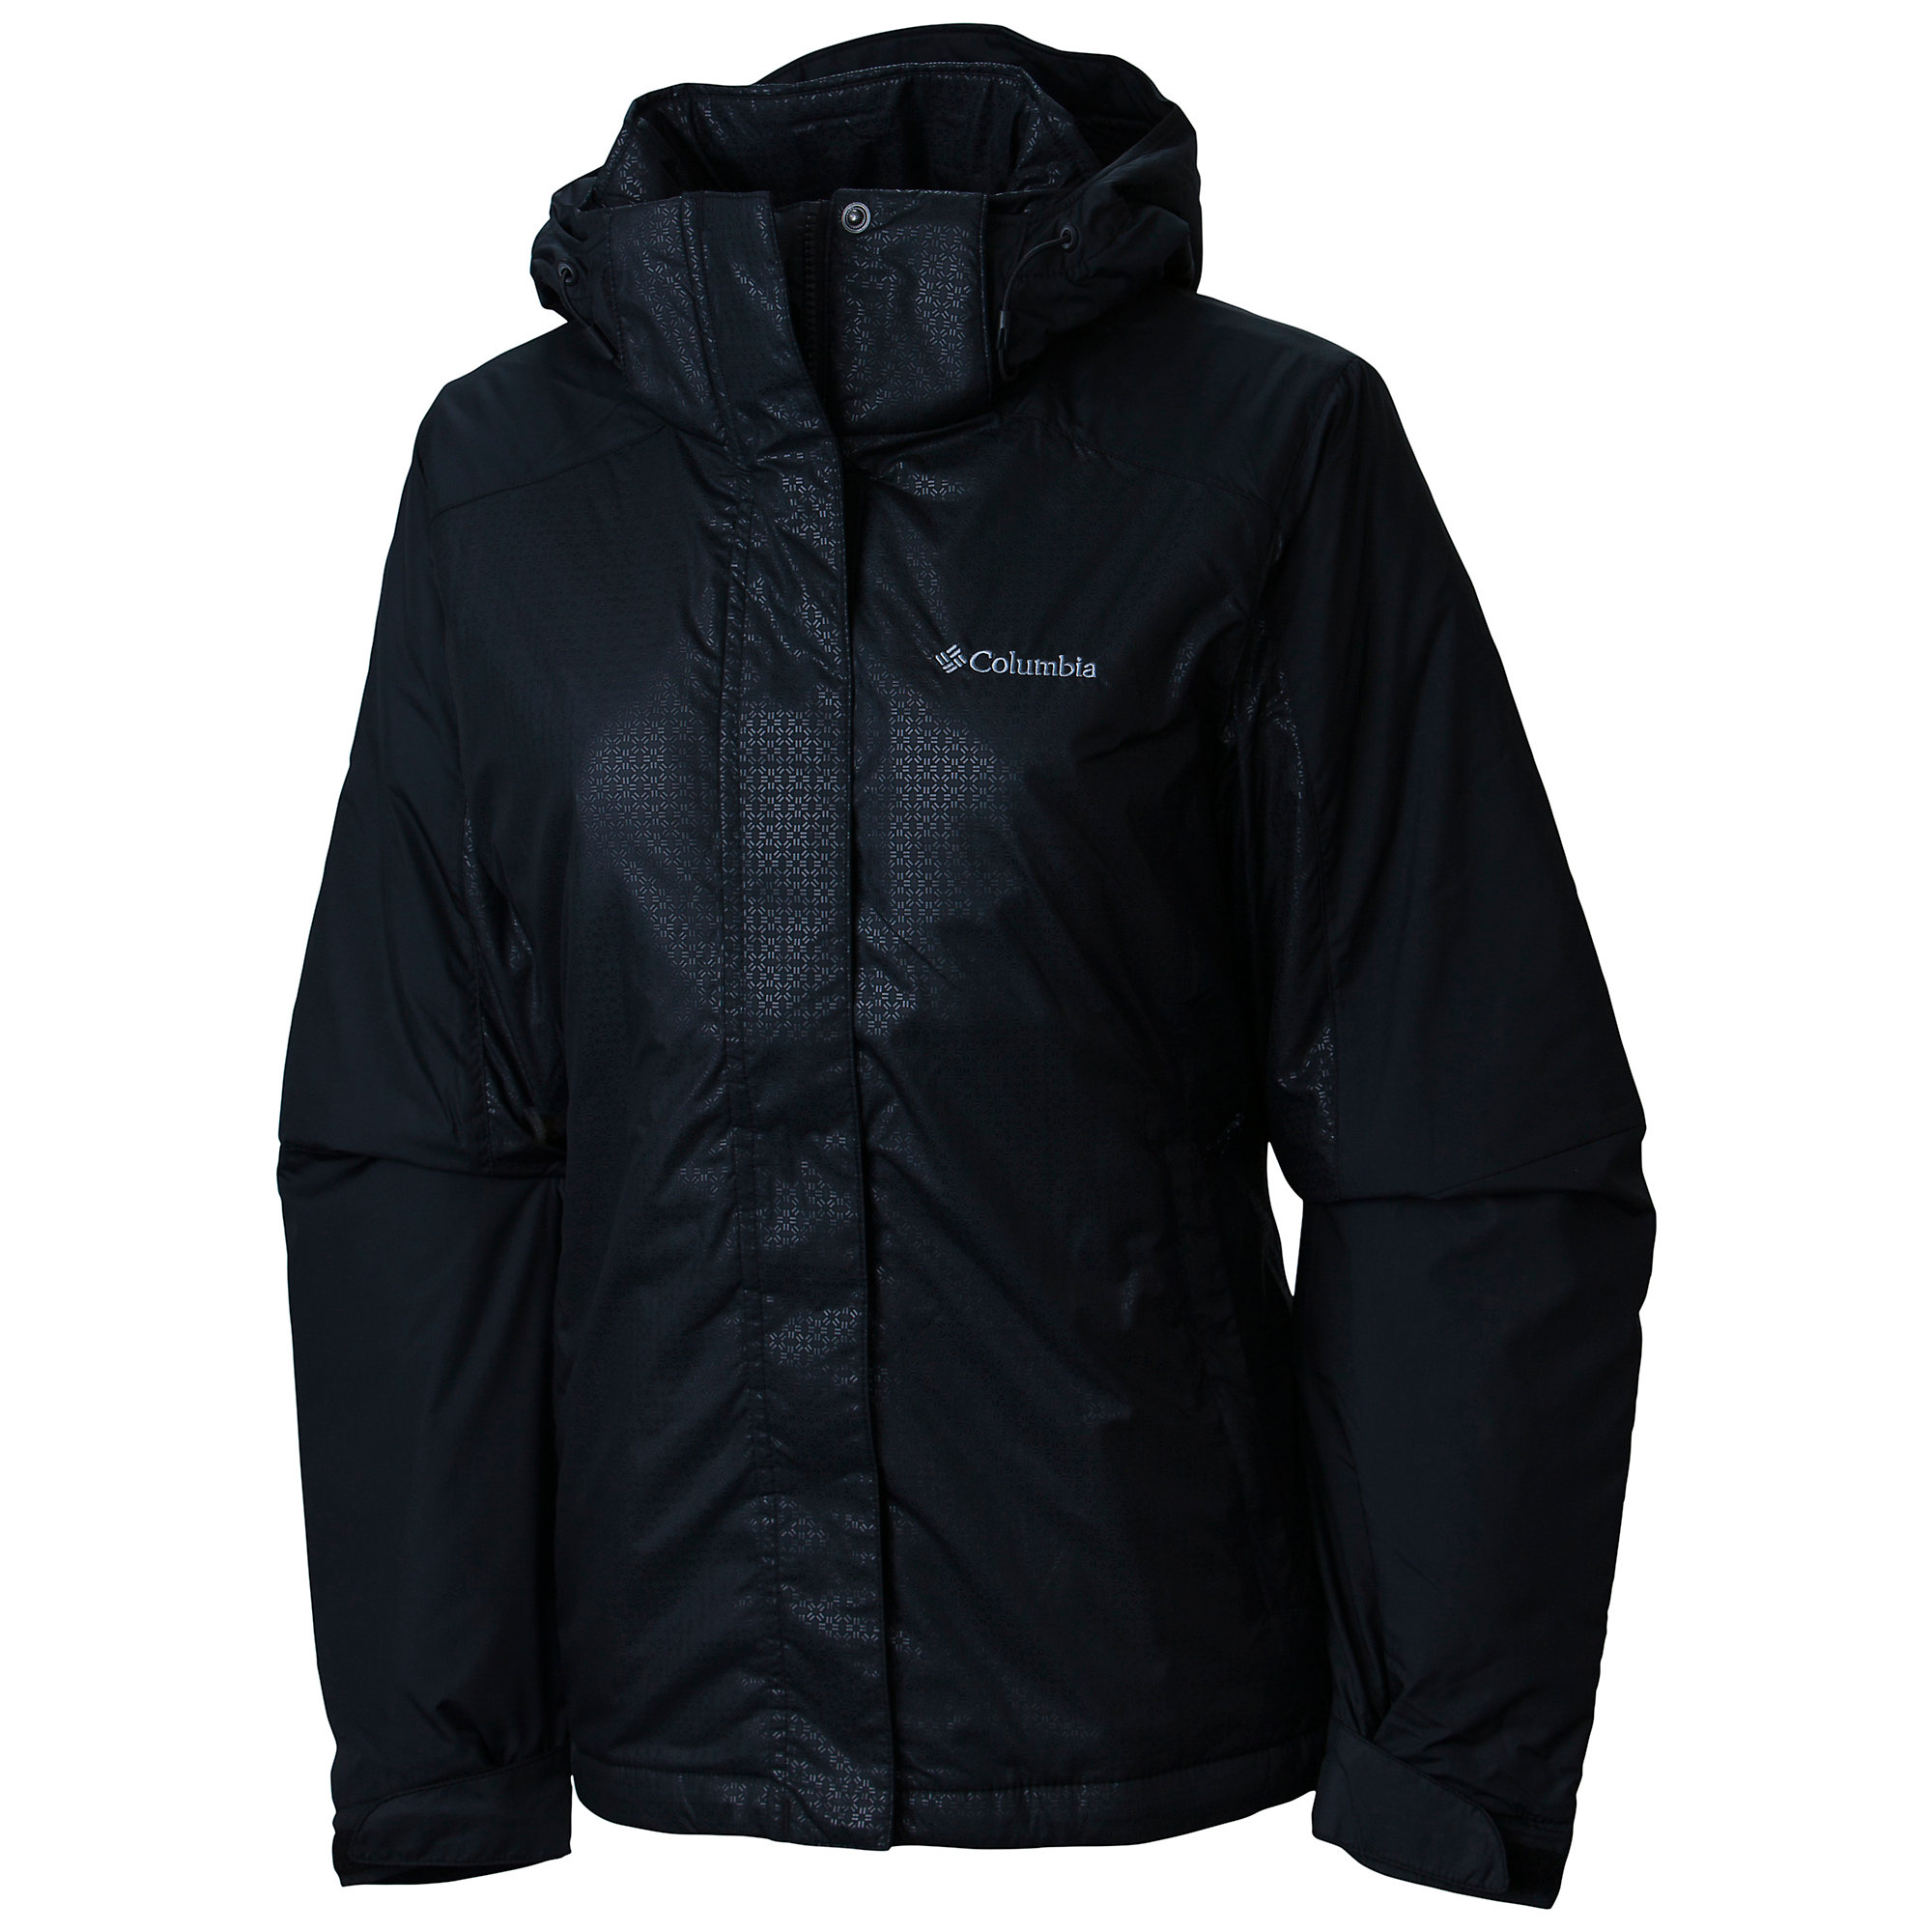 Columbia Gotcha Groovin' Jacket